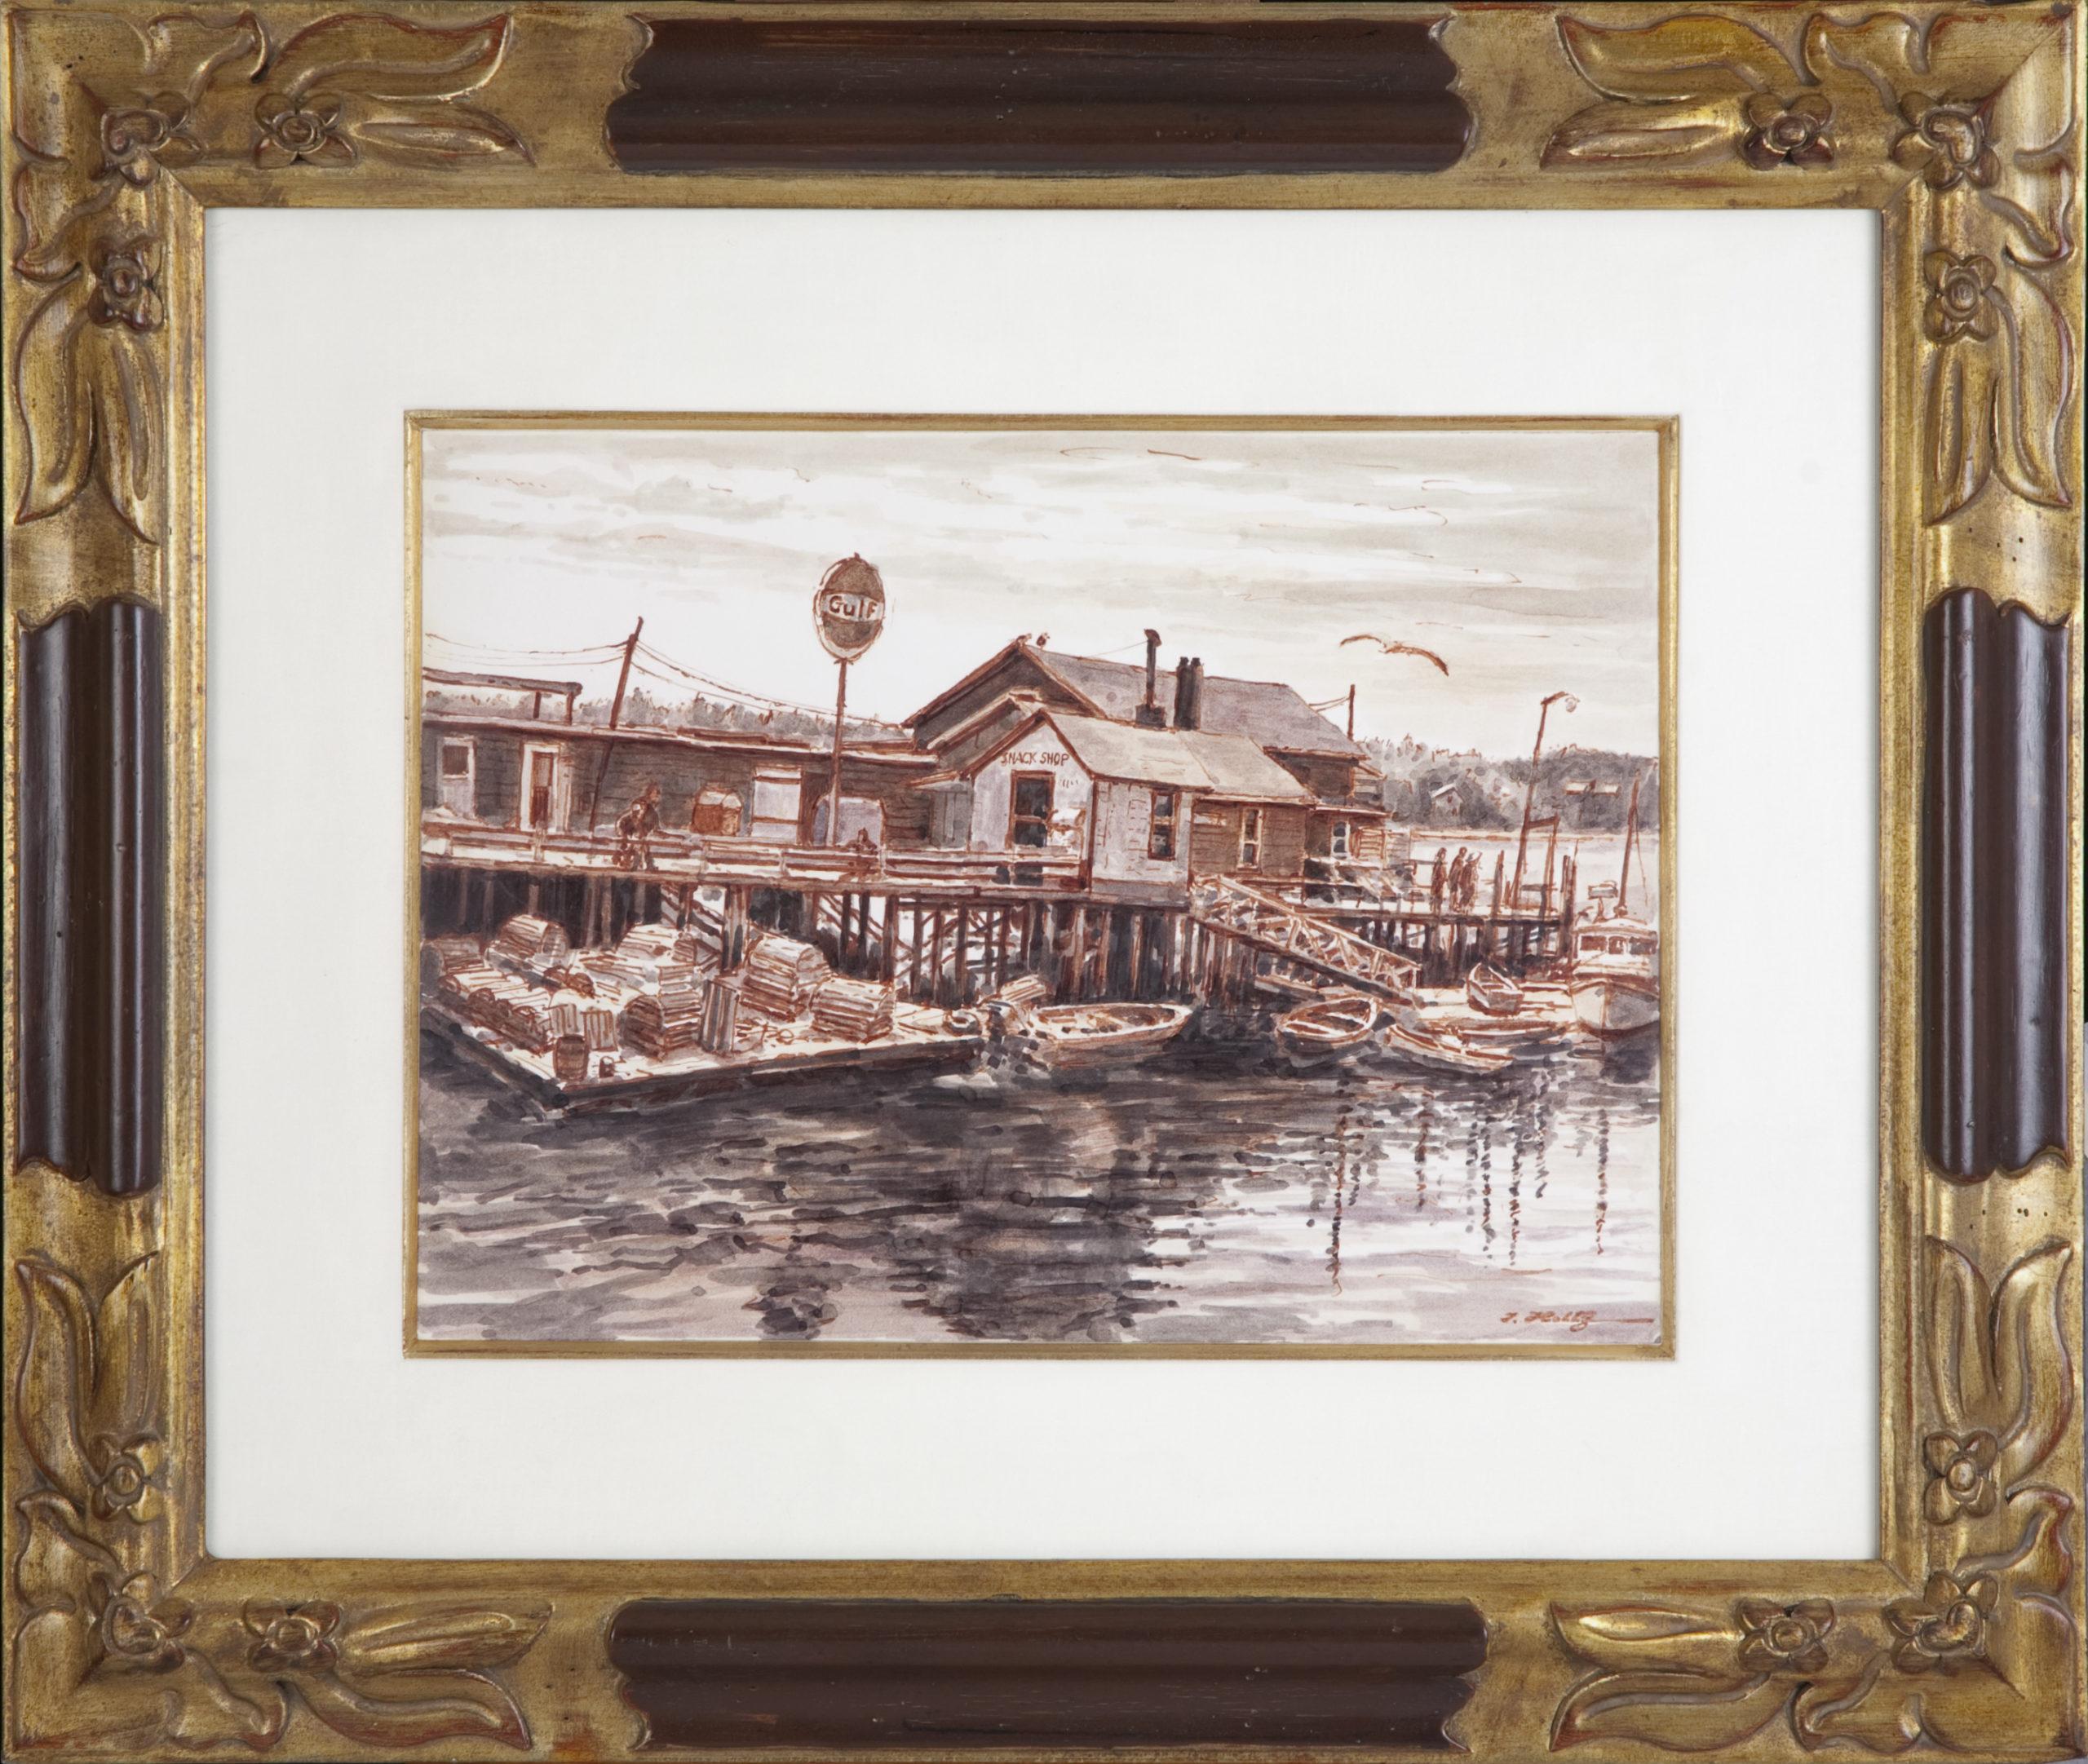 156 Maine Pier 1972 - Marker - 15 x 11 - Frame: 25 x 21 x 1.25